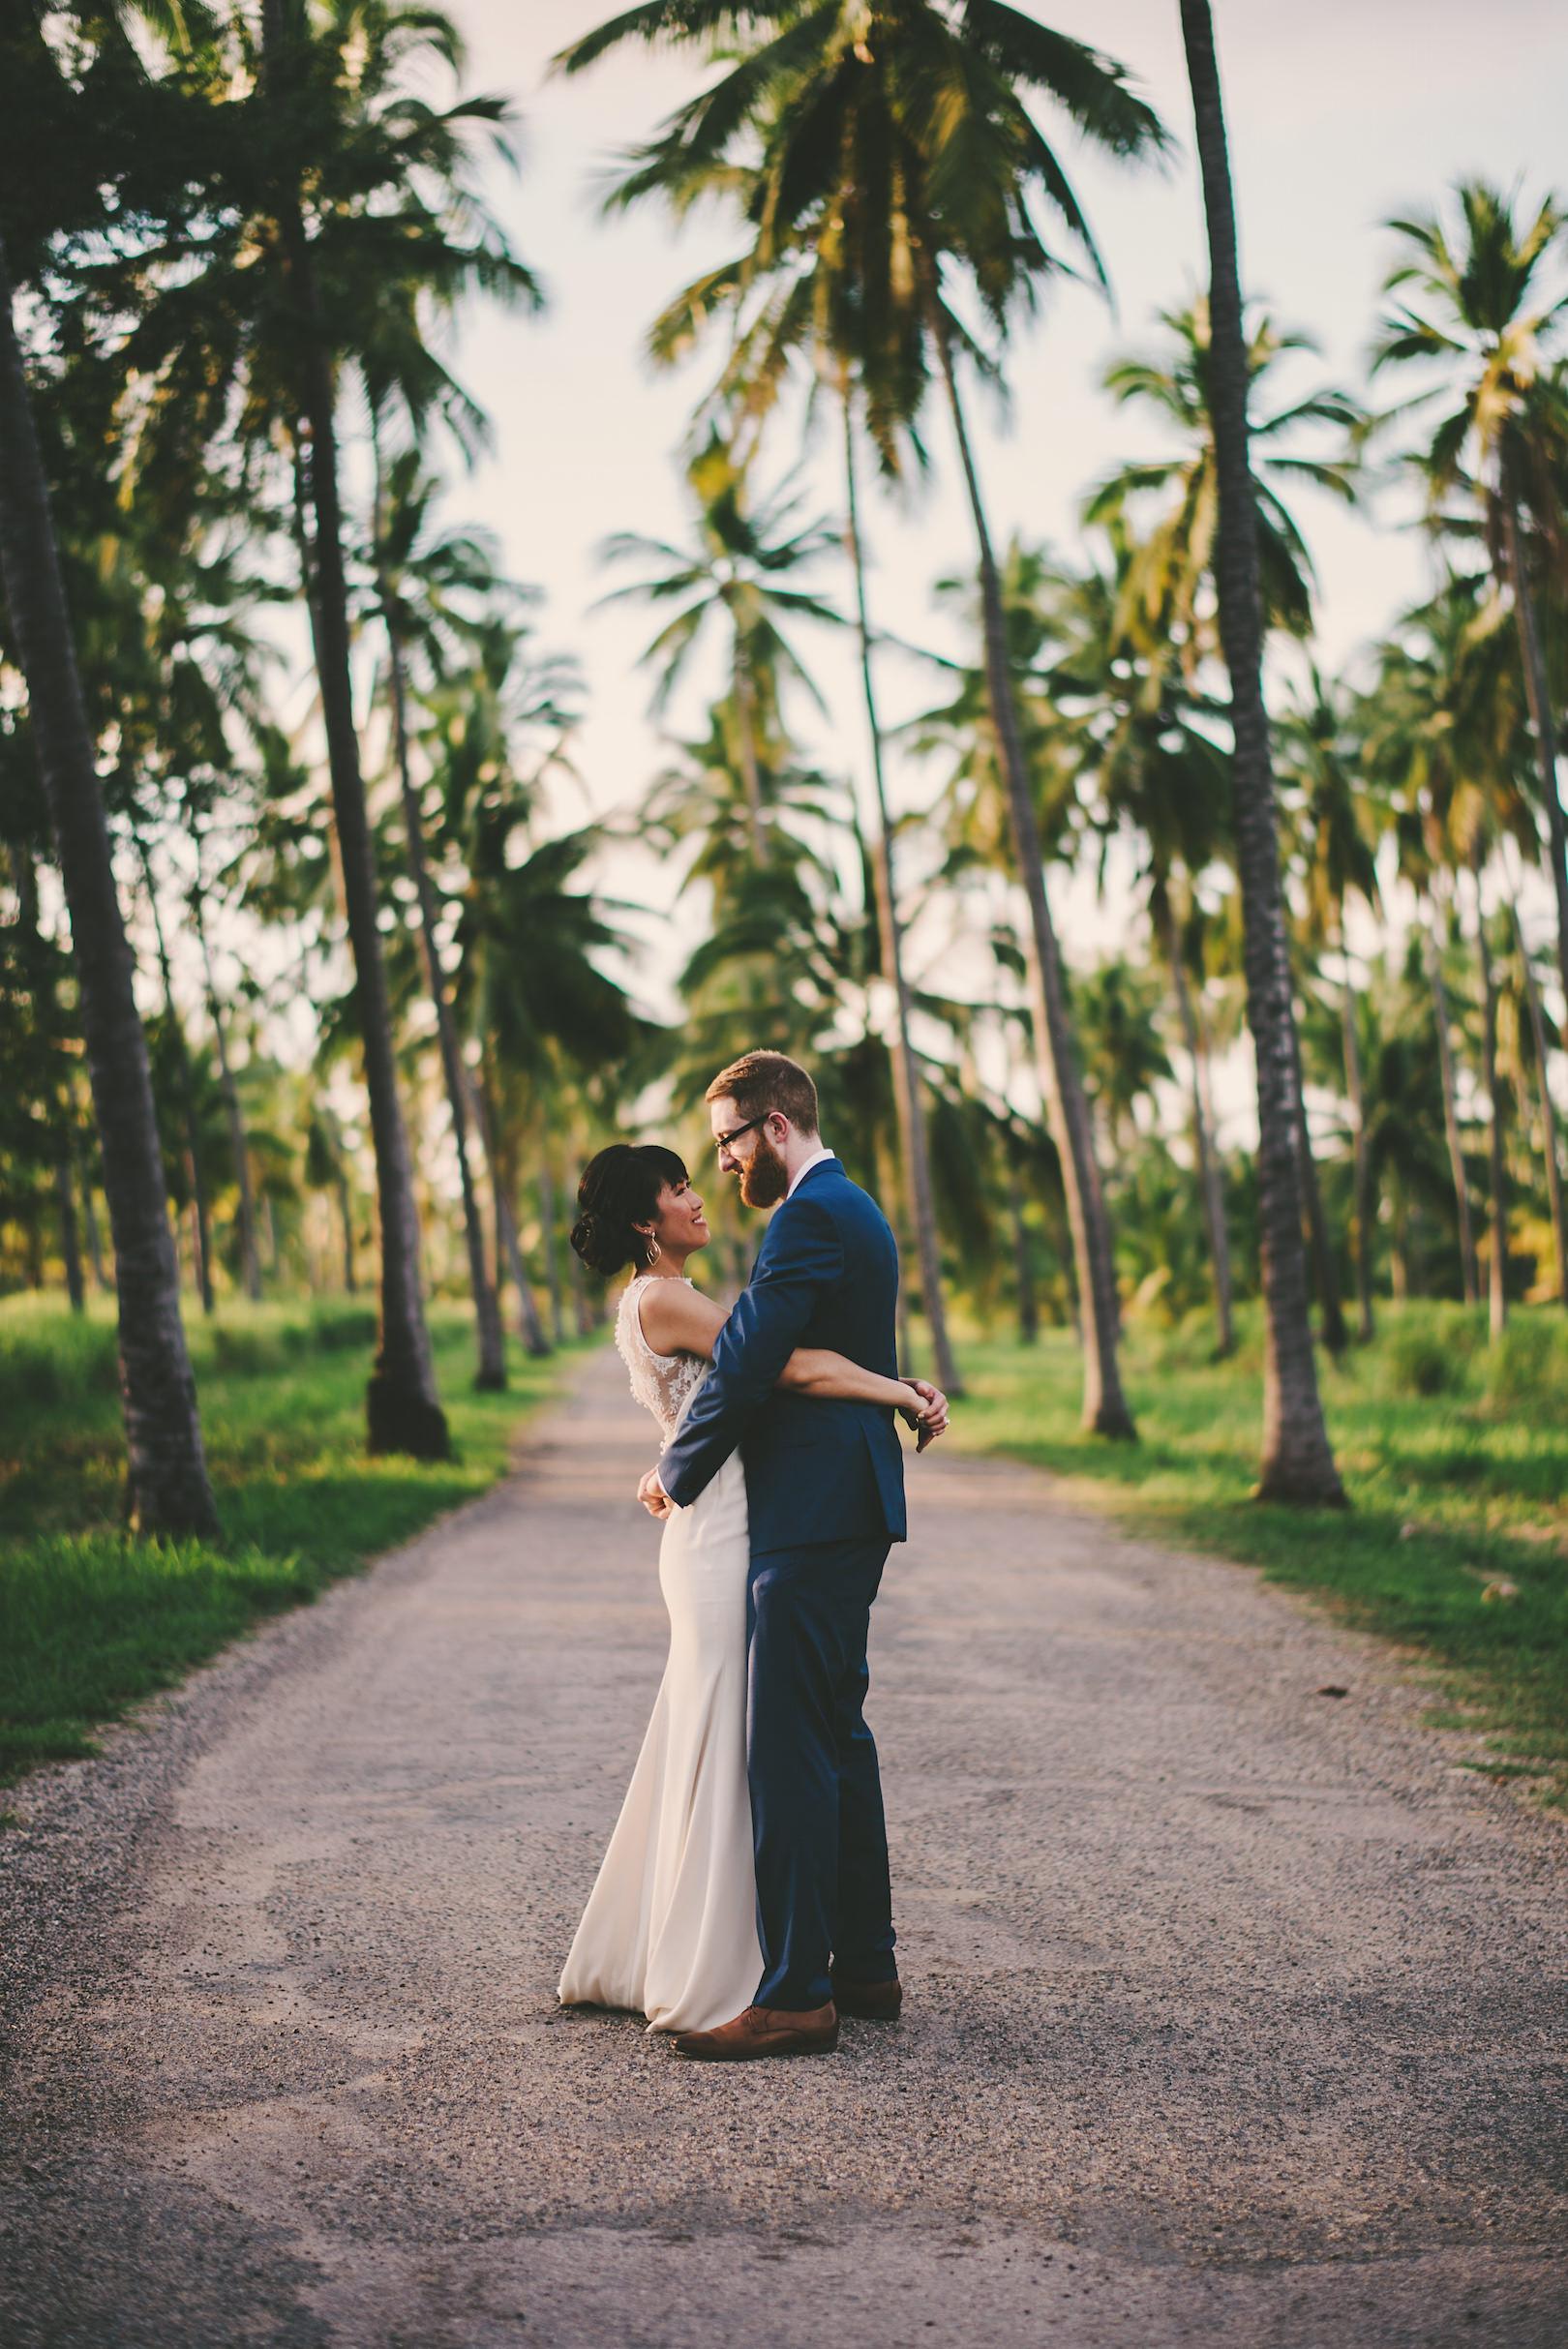 Nathan & Felicia - Wedding Day - © Dallas Kolotylo Photography - 503